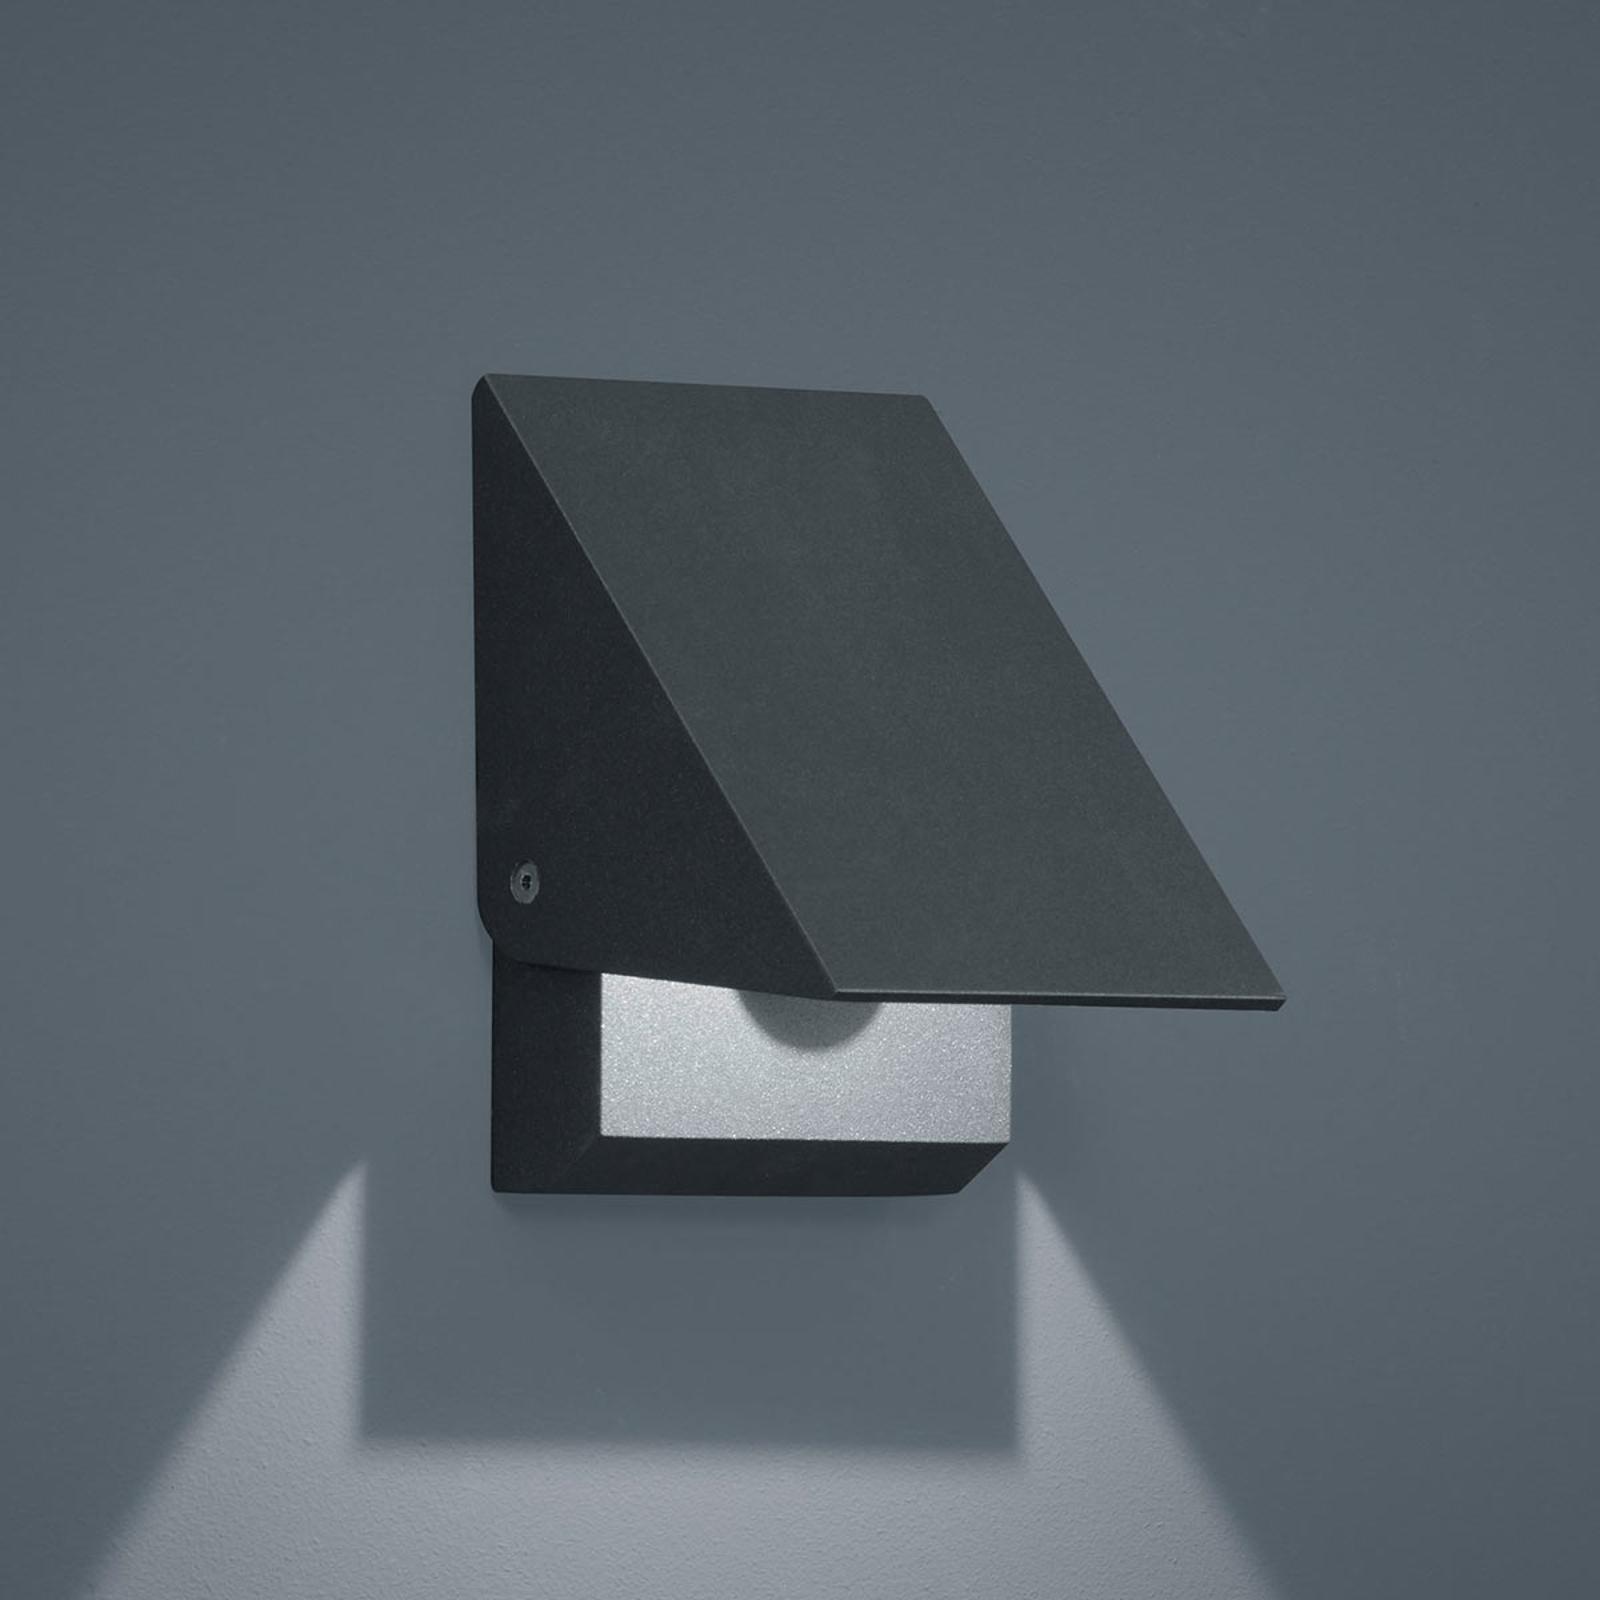 Helestra Free LED-Außenwandlampe graphit m. Blende